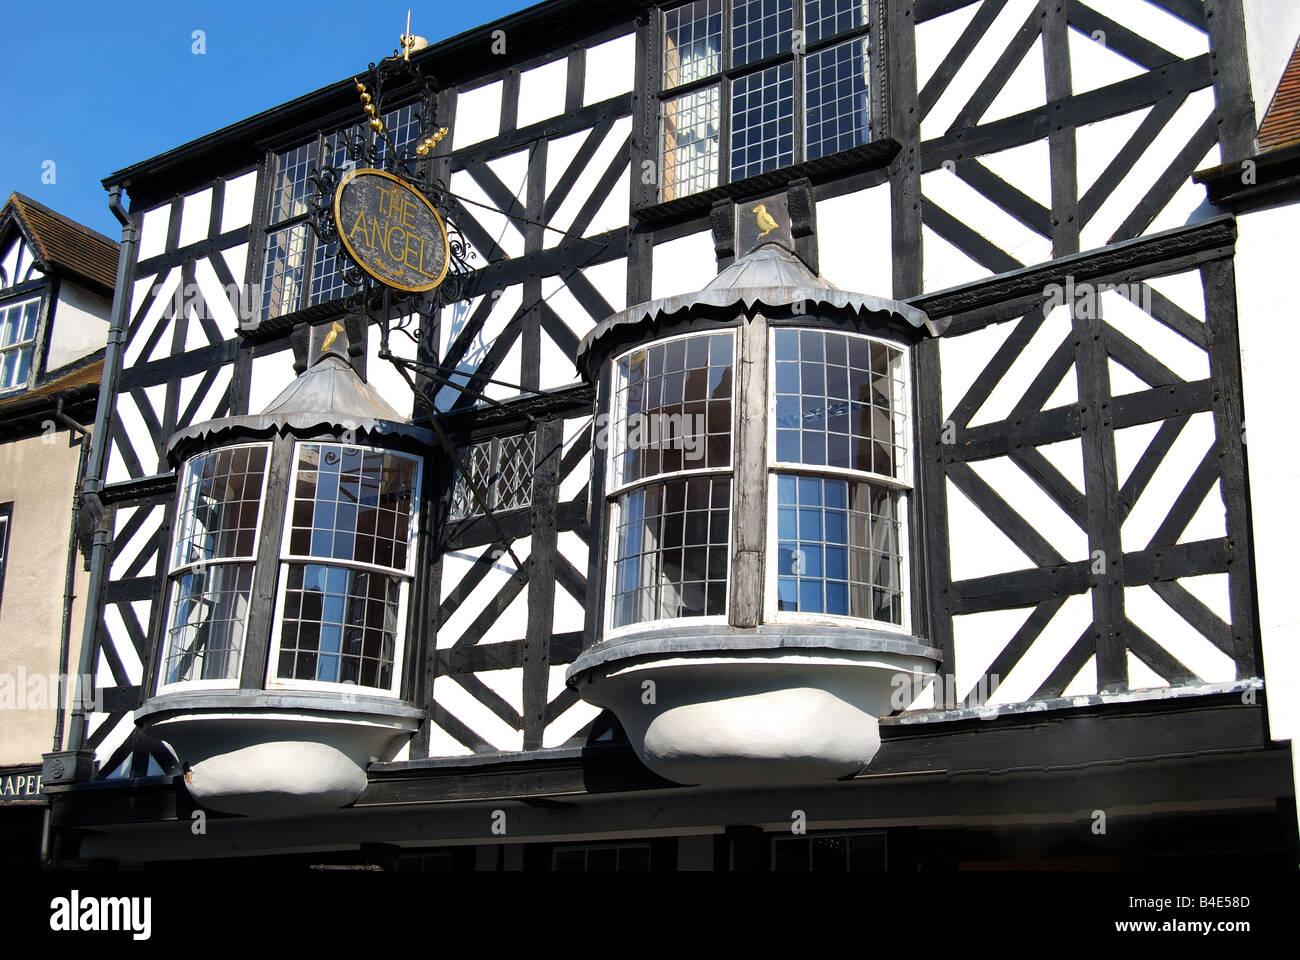 Der Engel Tudor House Fassade, Broad Street, Ludlow, Shropshire, England, Vereinigtes Königreich Stockfoto